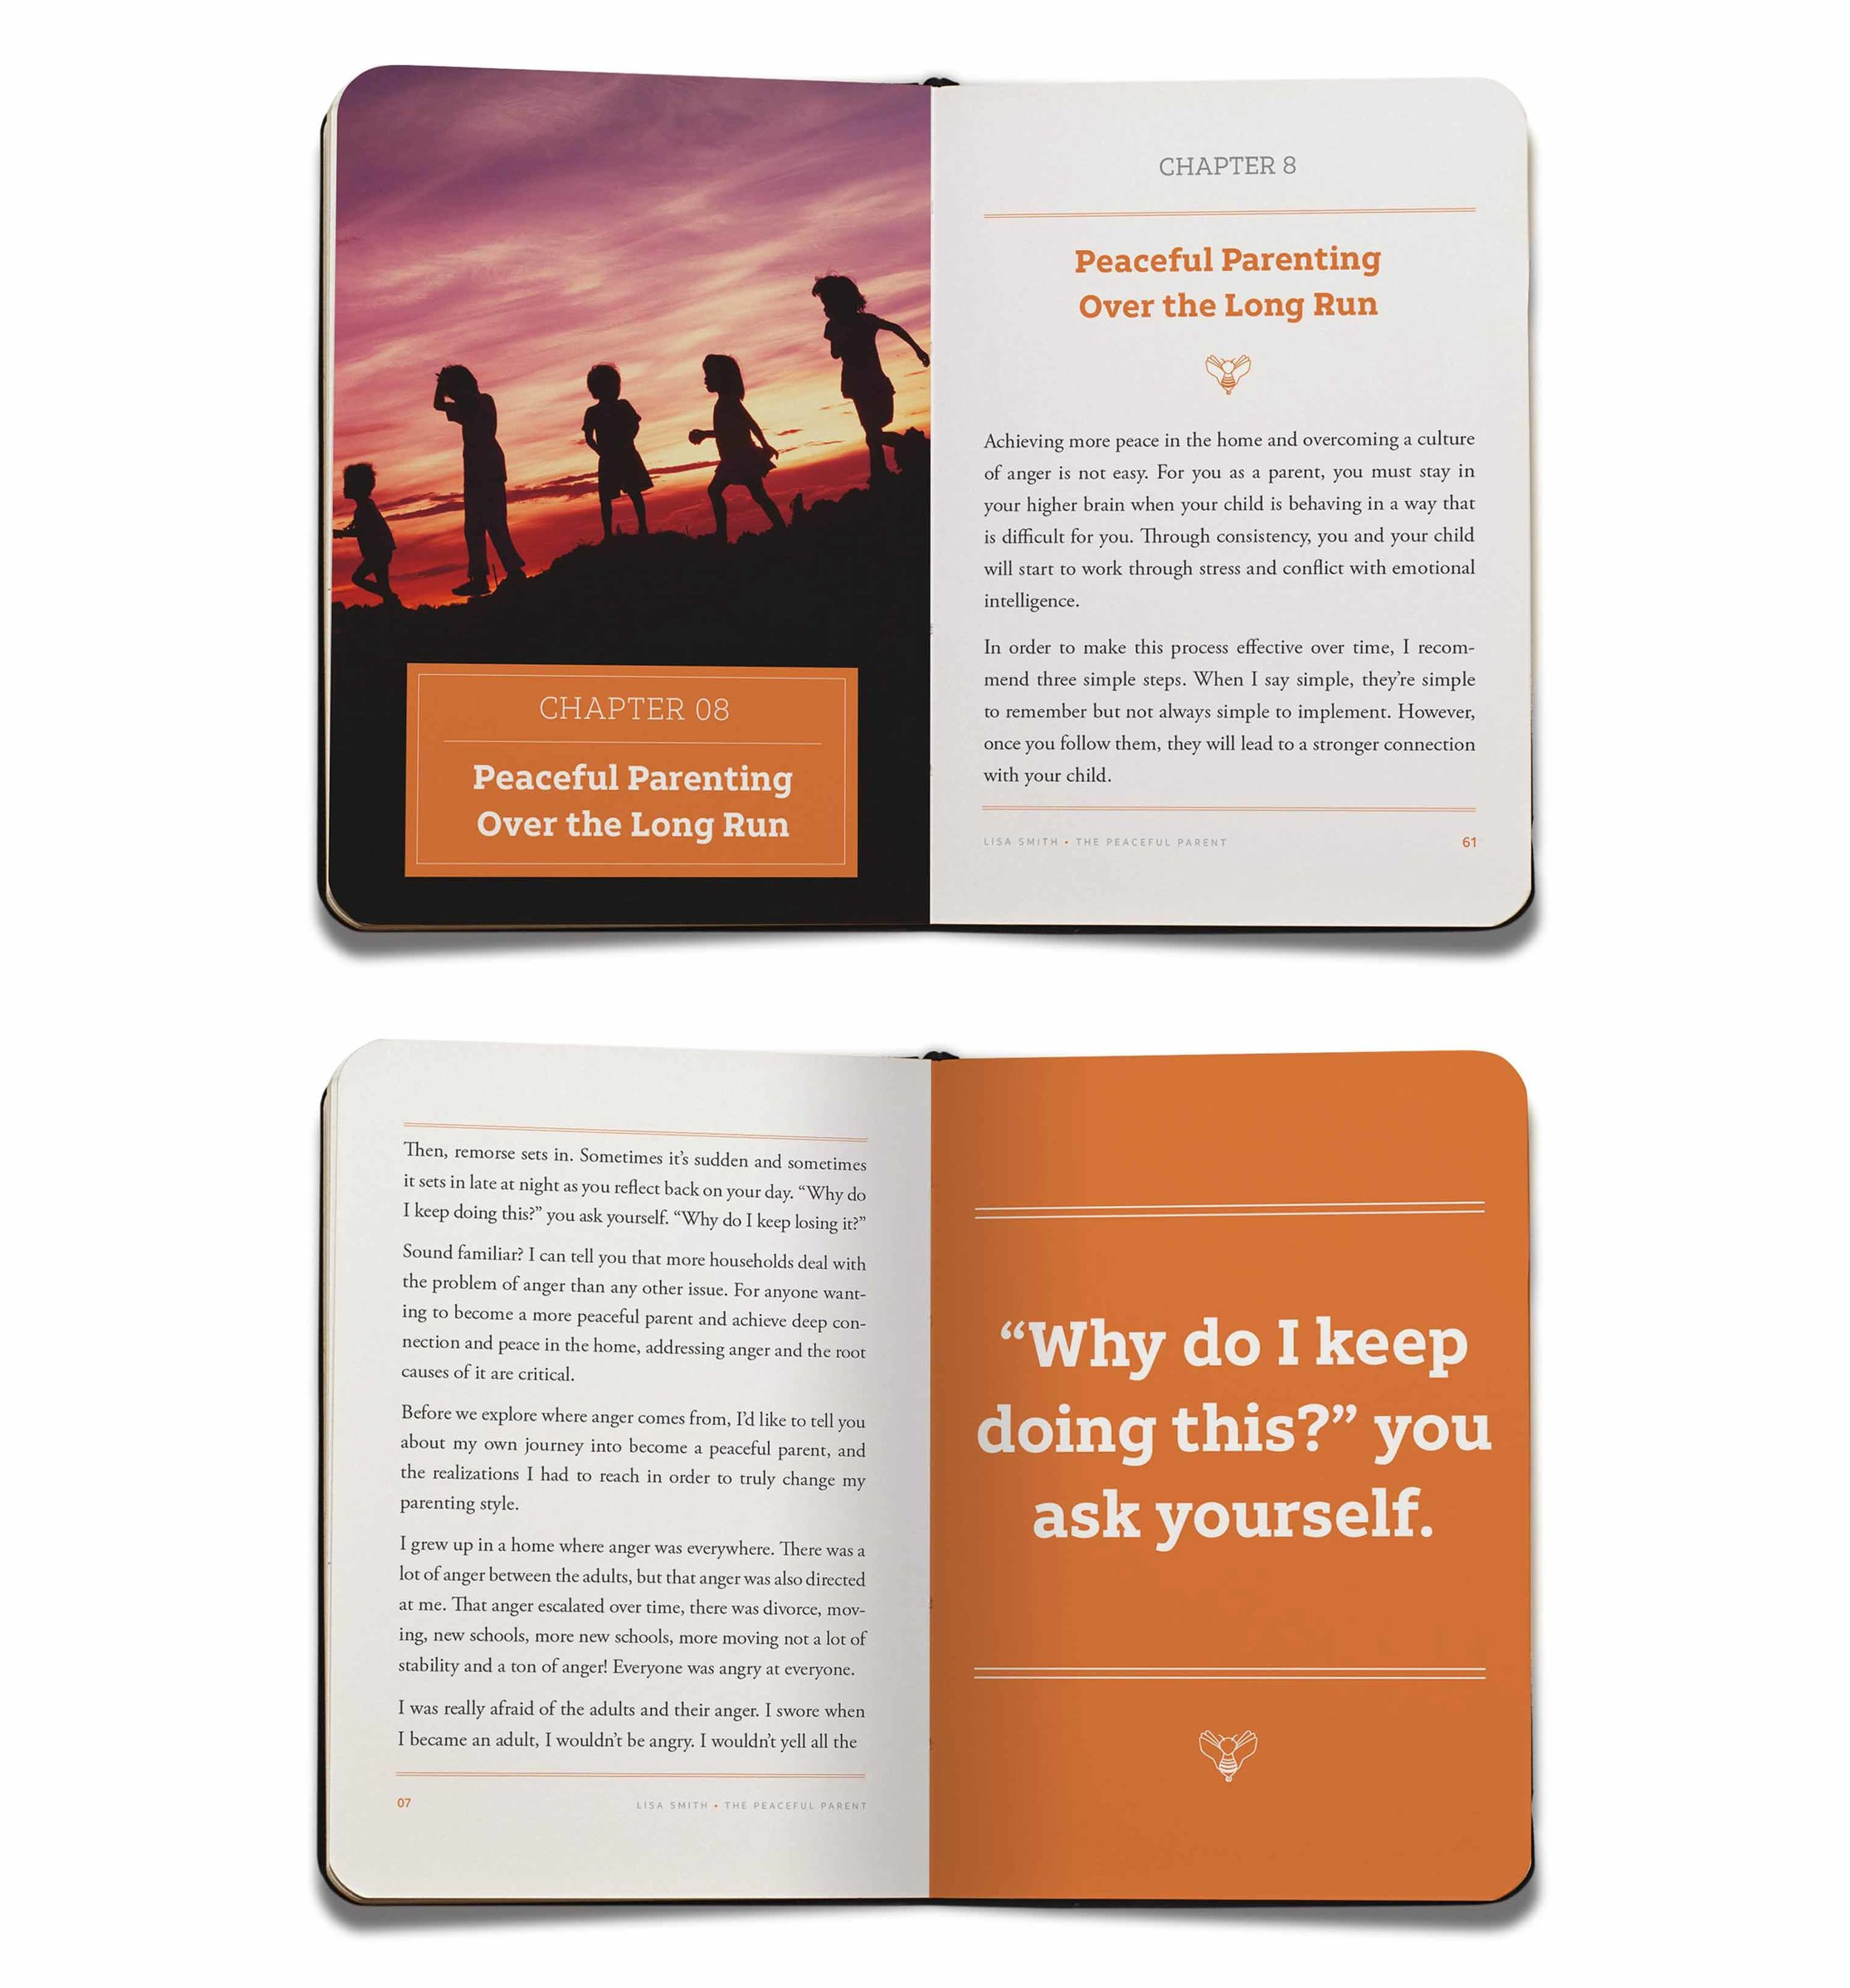 TPP_book_Vertical_02.jpg